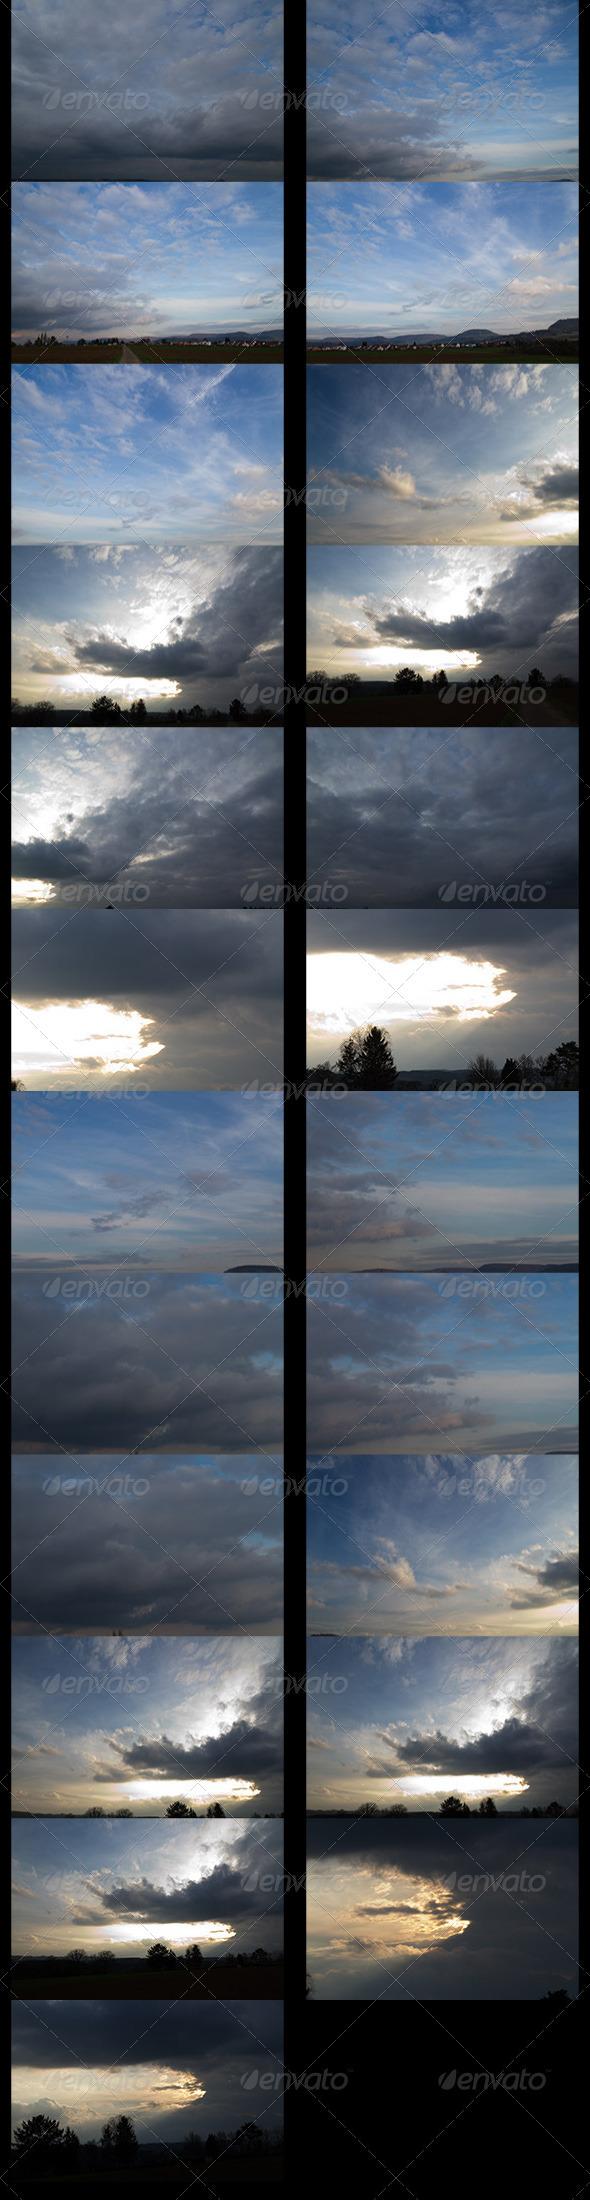 HDRI spherical sky panorama -1901- spring evening